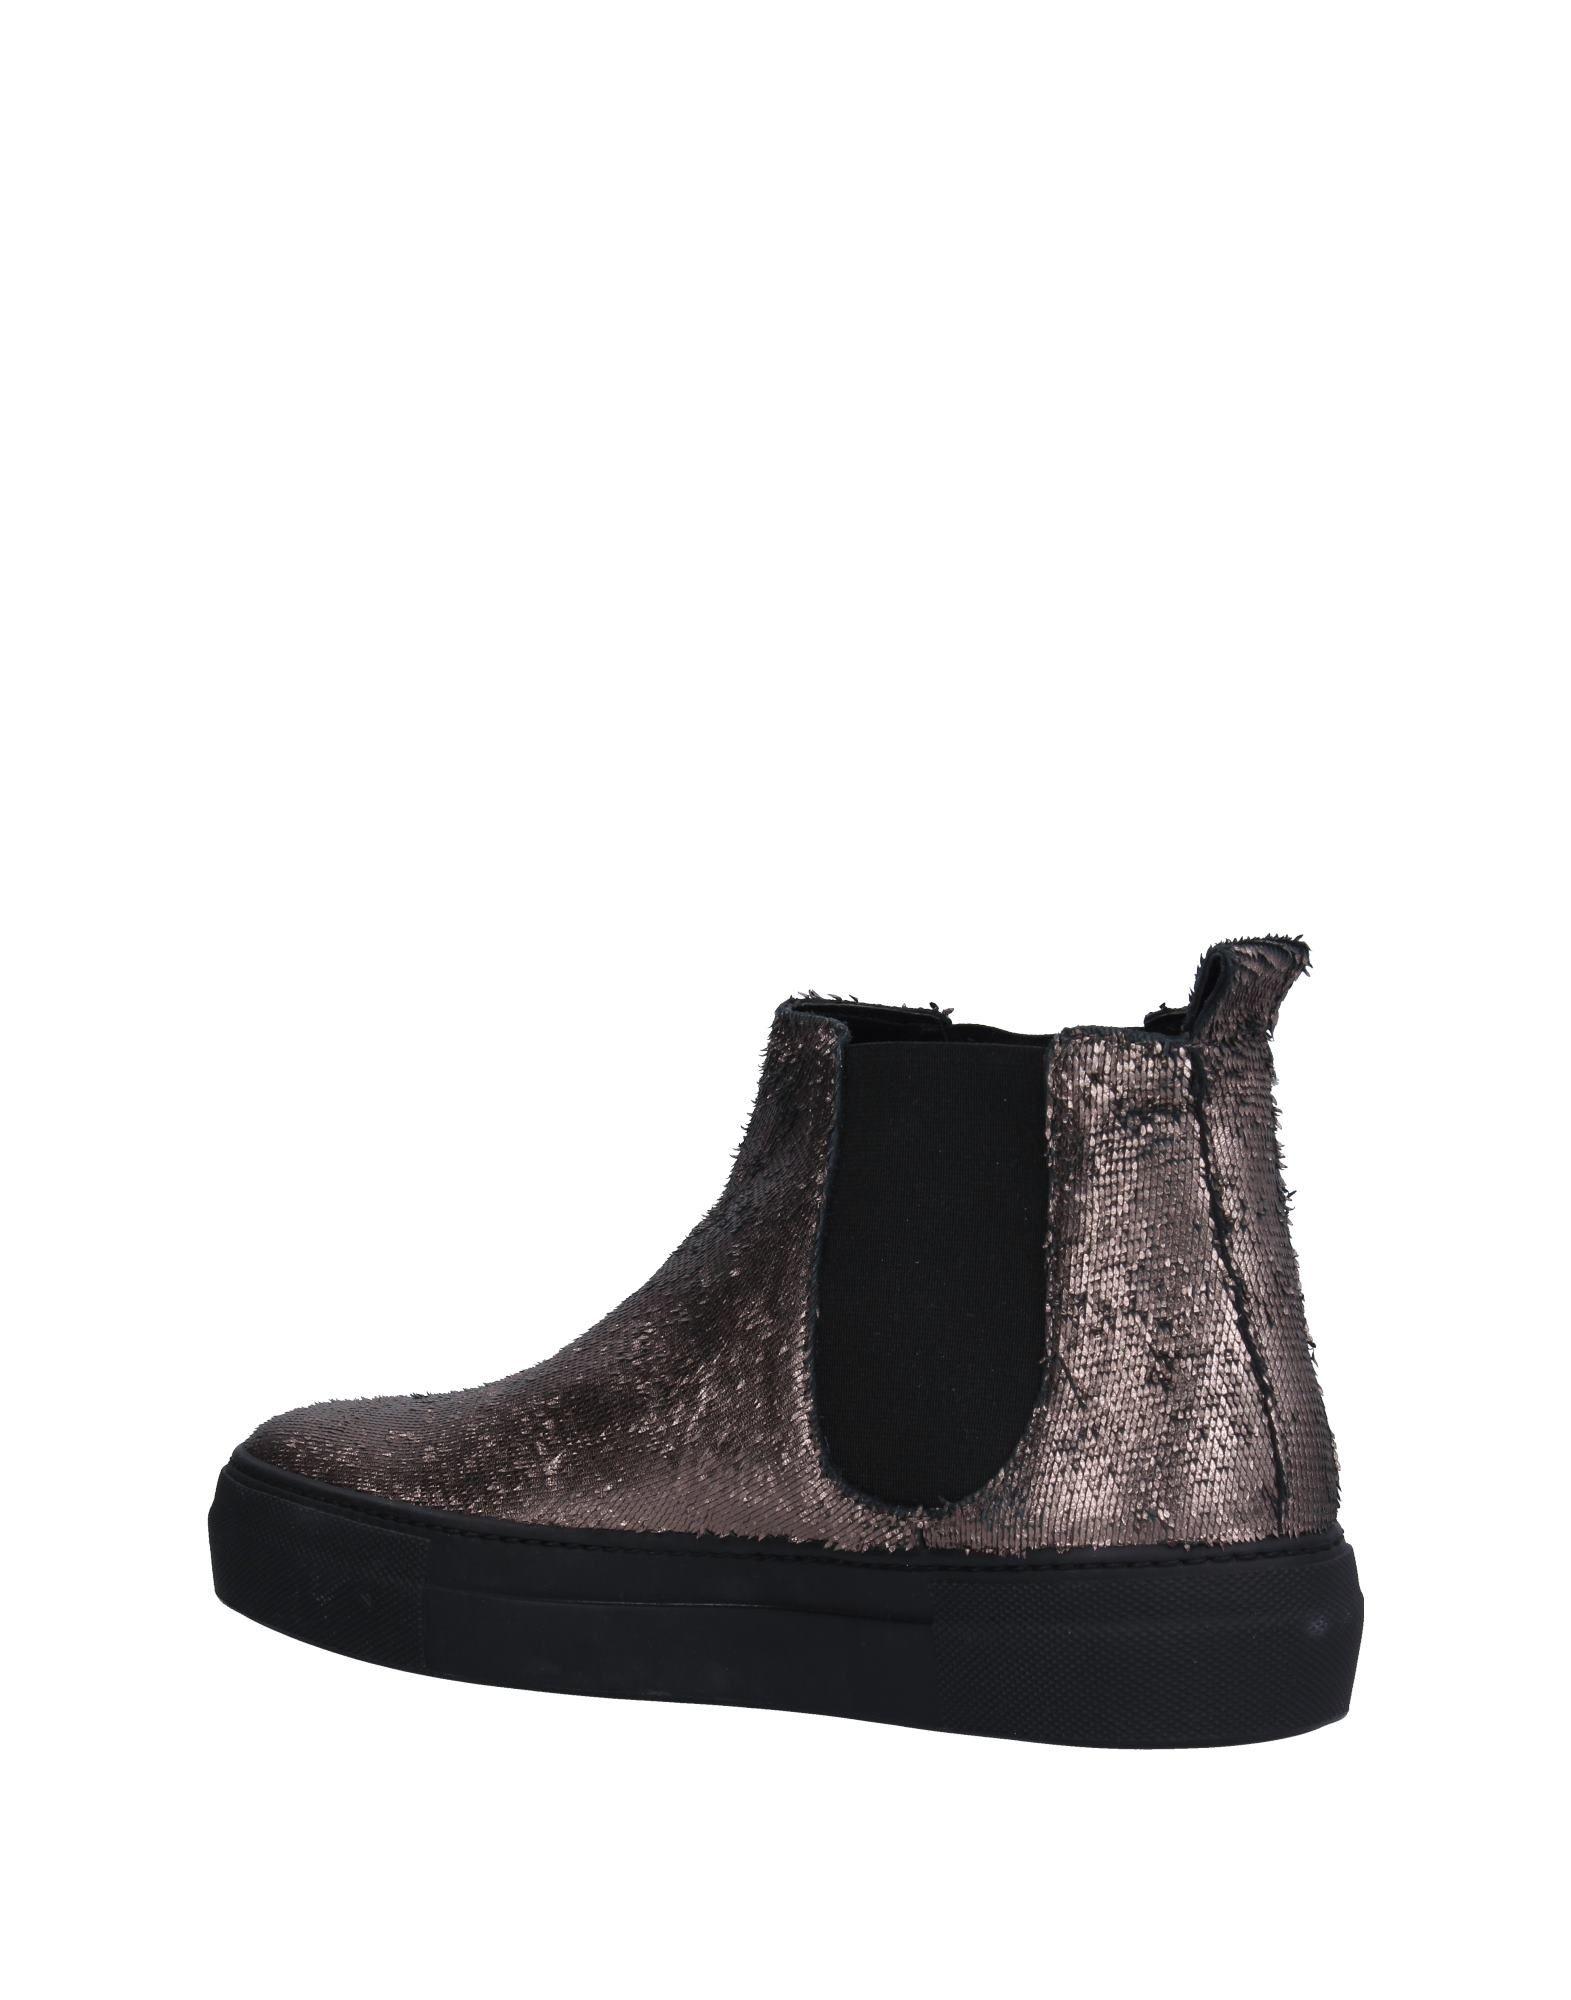 Moda Sneakers Stokton Donna - - Donna 11212975EM cc14f2